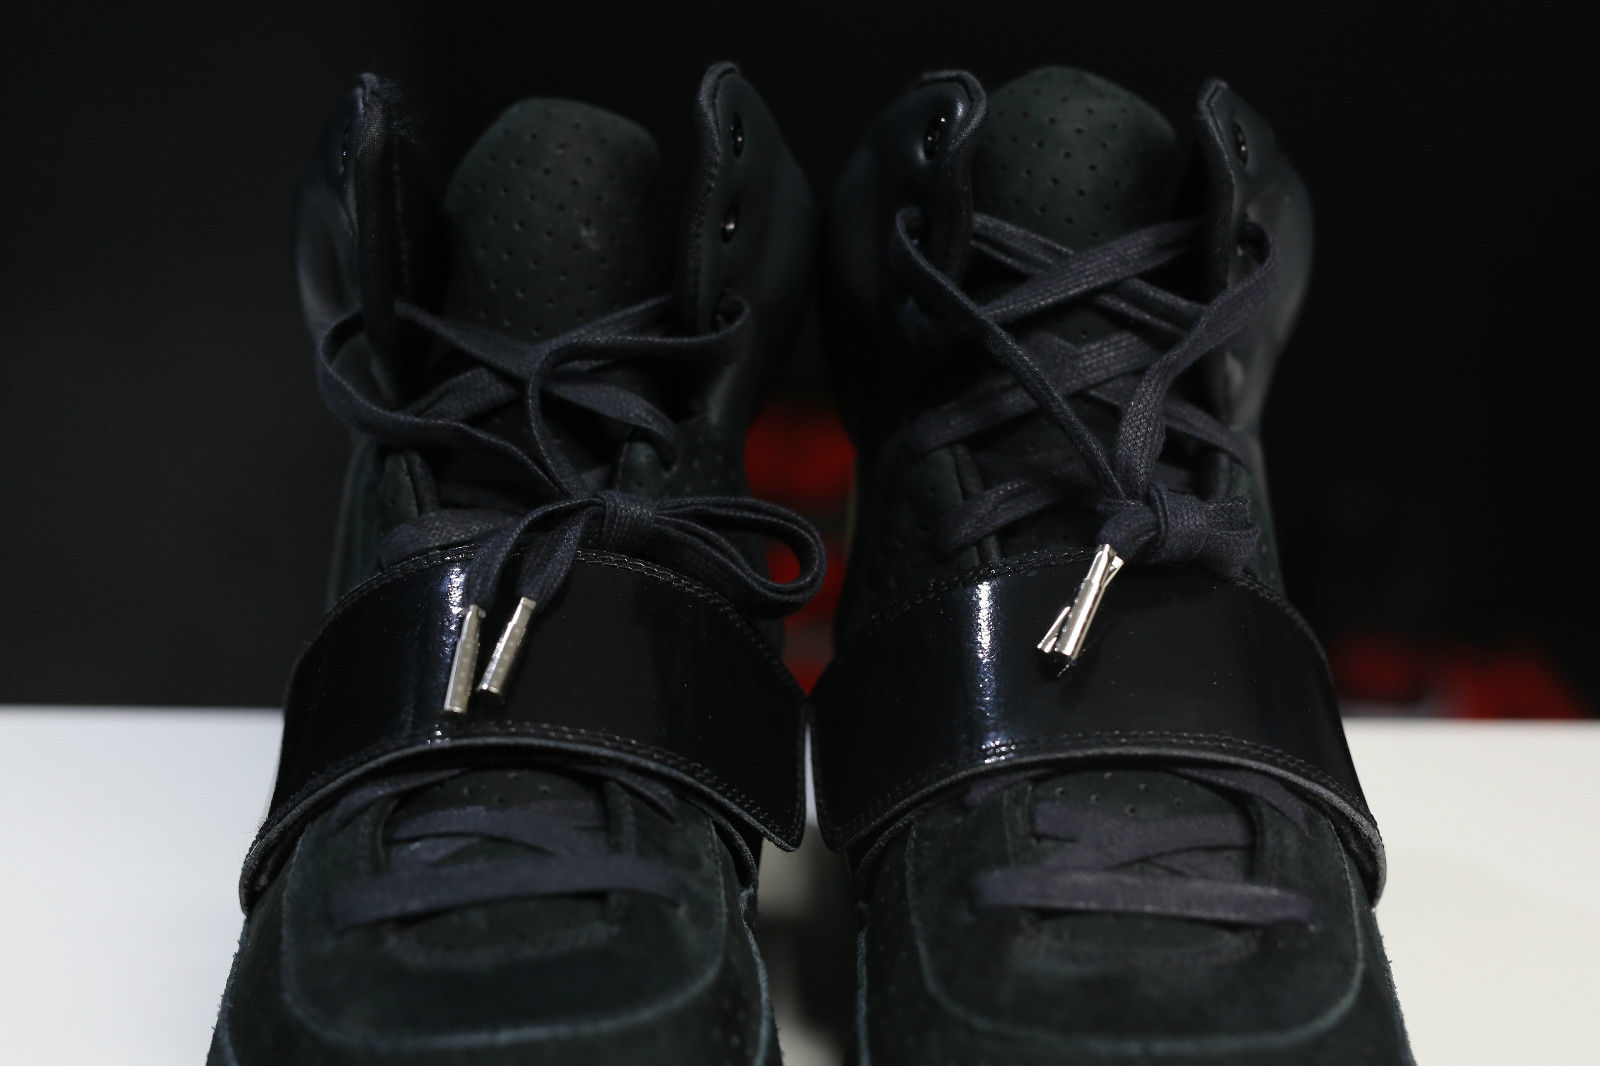 Nike Air Yeezy Kanye West Black/White Sample Pair Strap